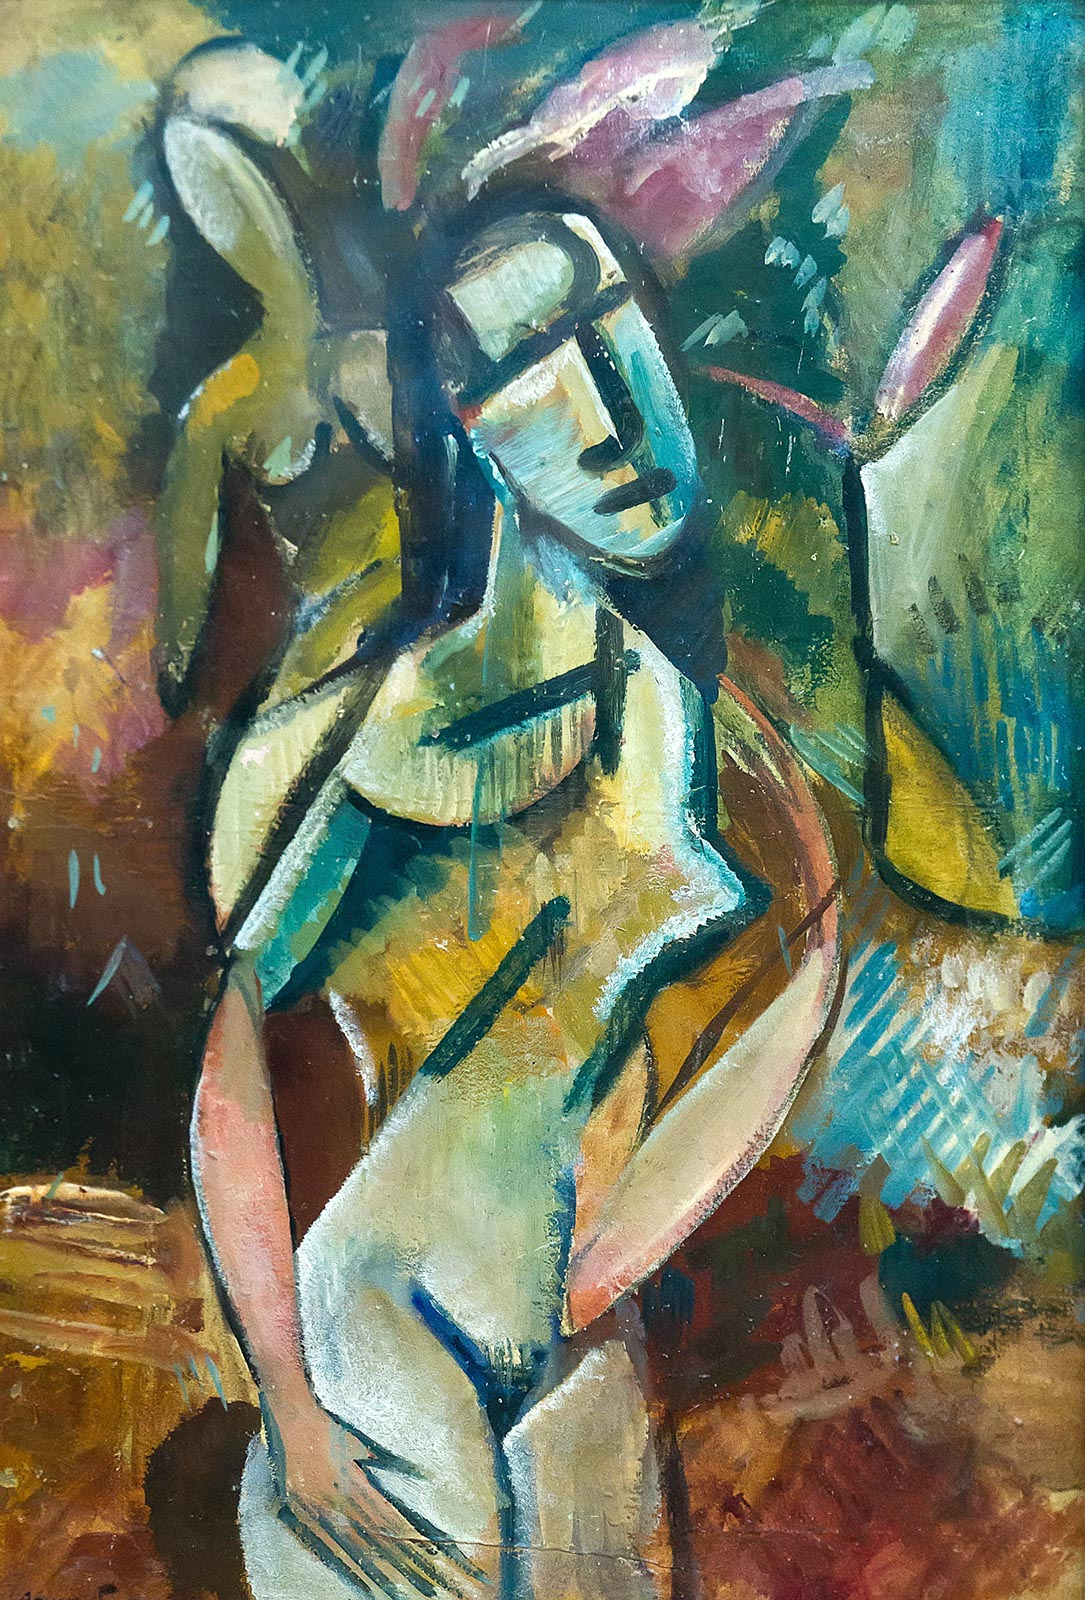 Фото №212451. РОДЧЕНКО АЛЕКСАНДР МИХАЙЛОВИЧ 1891-1956 ДЕВУШКА С ЦВЕТКОМ. 1915-1916 Картон, темпера, лак